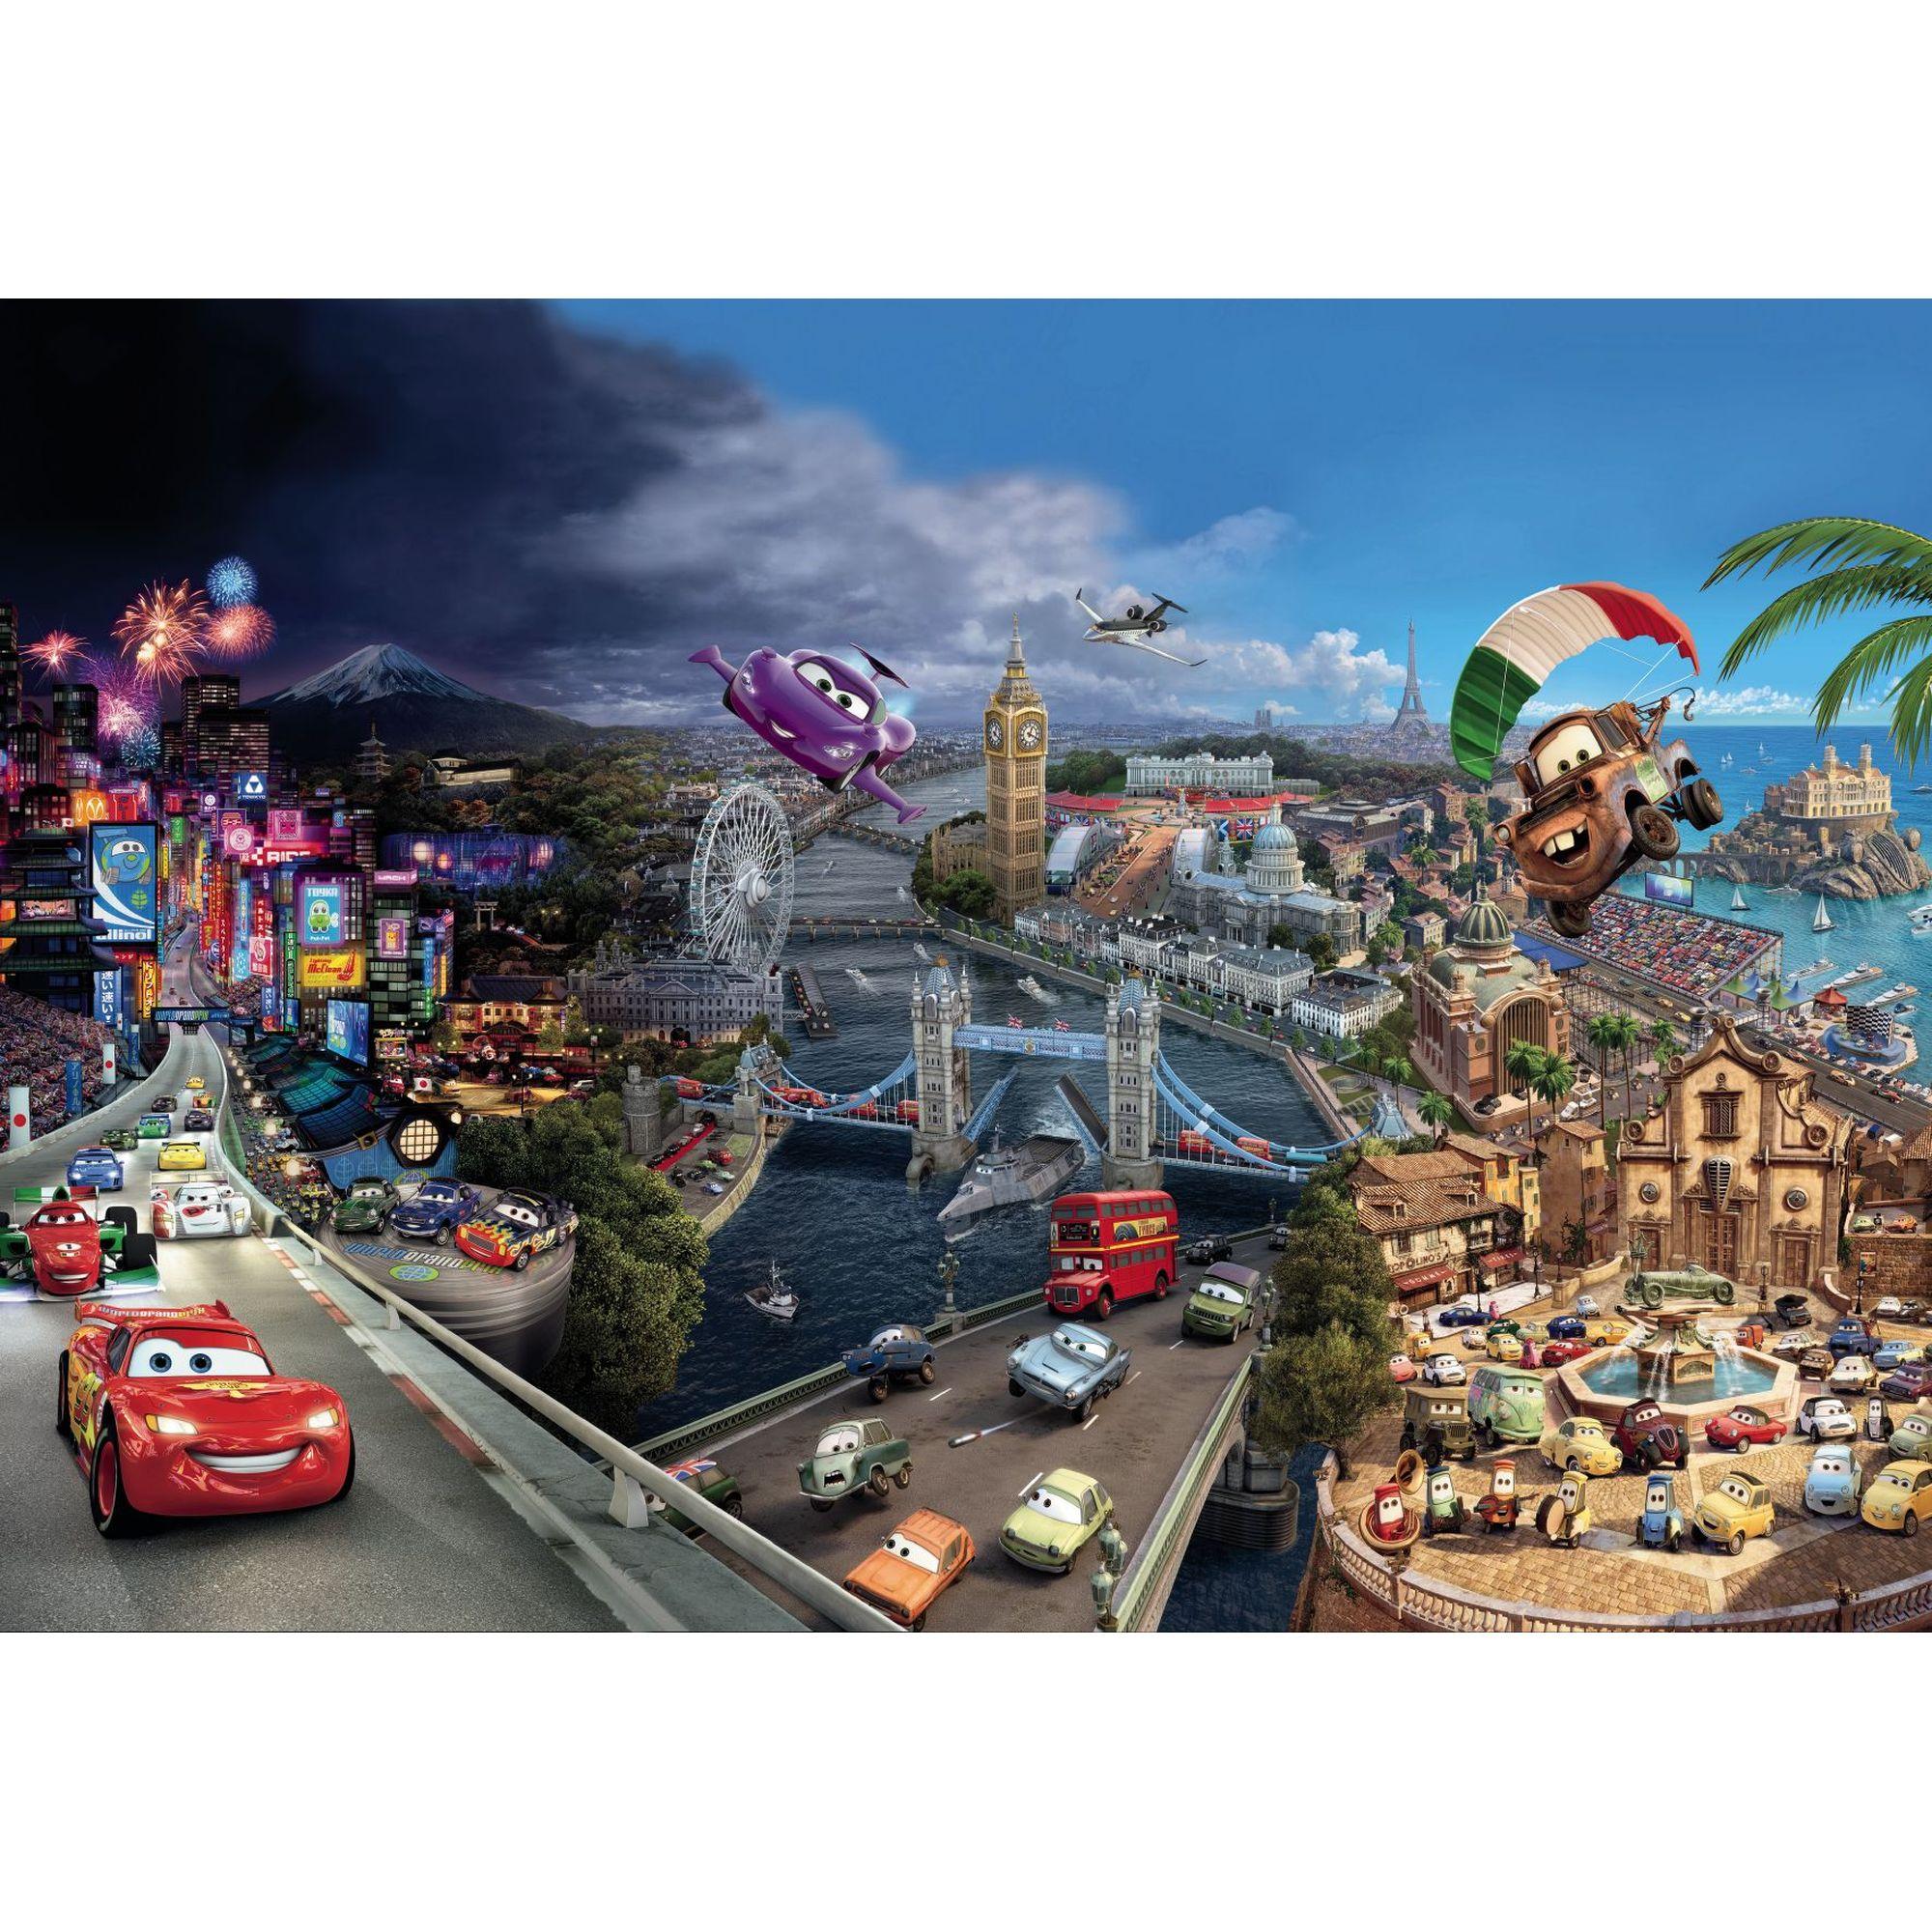 Фотопанно бумажное «Cars World» 368х254 см